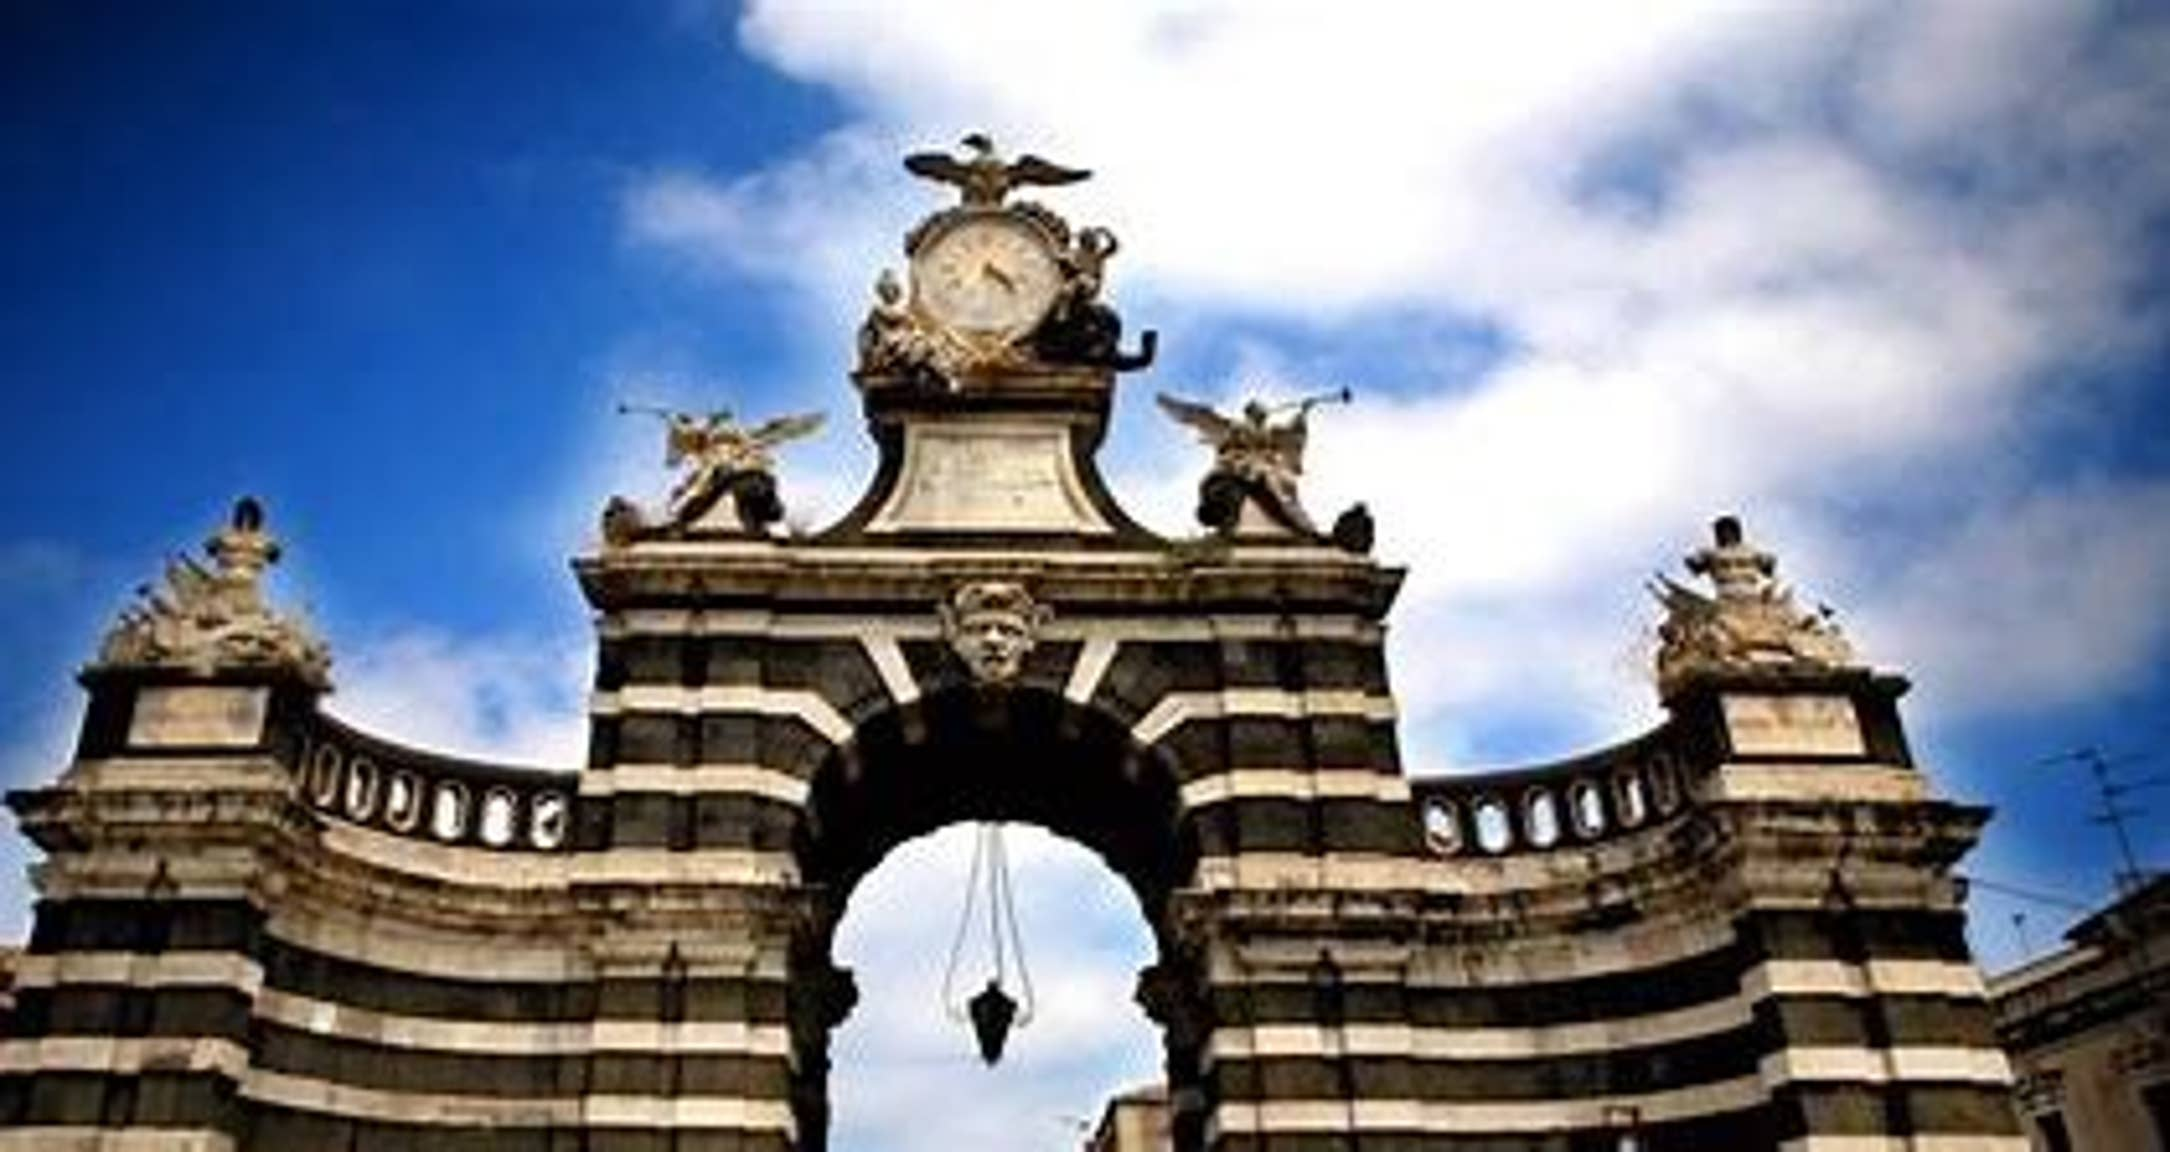 Maison de vacances  (2782175), Catania, Catania, Sicile, Italie, image 30